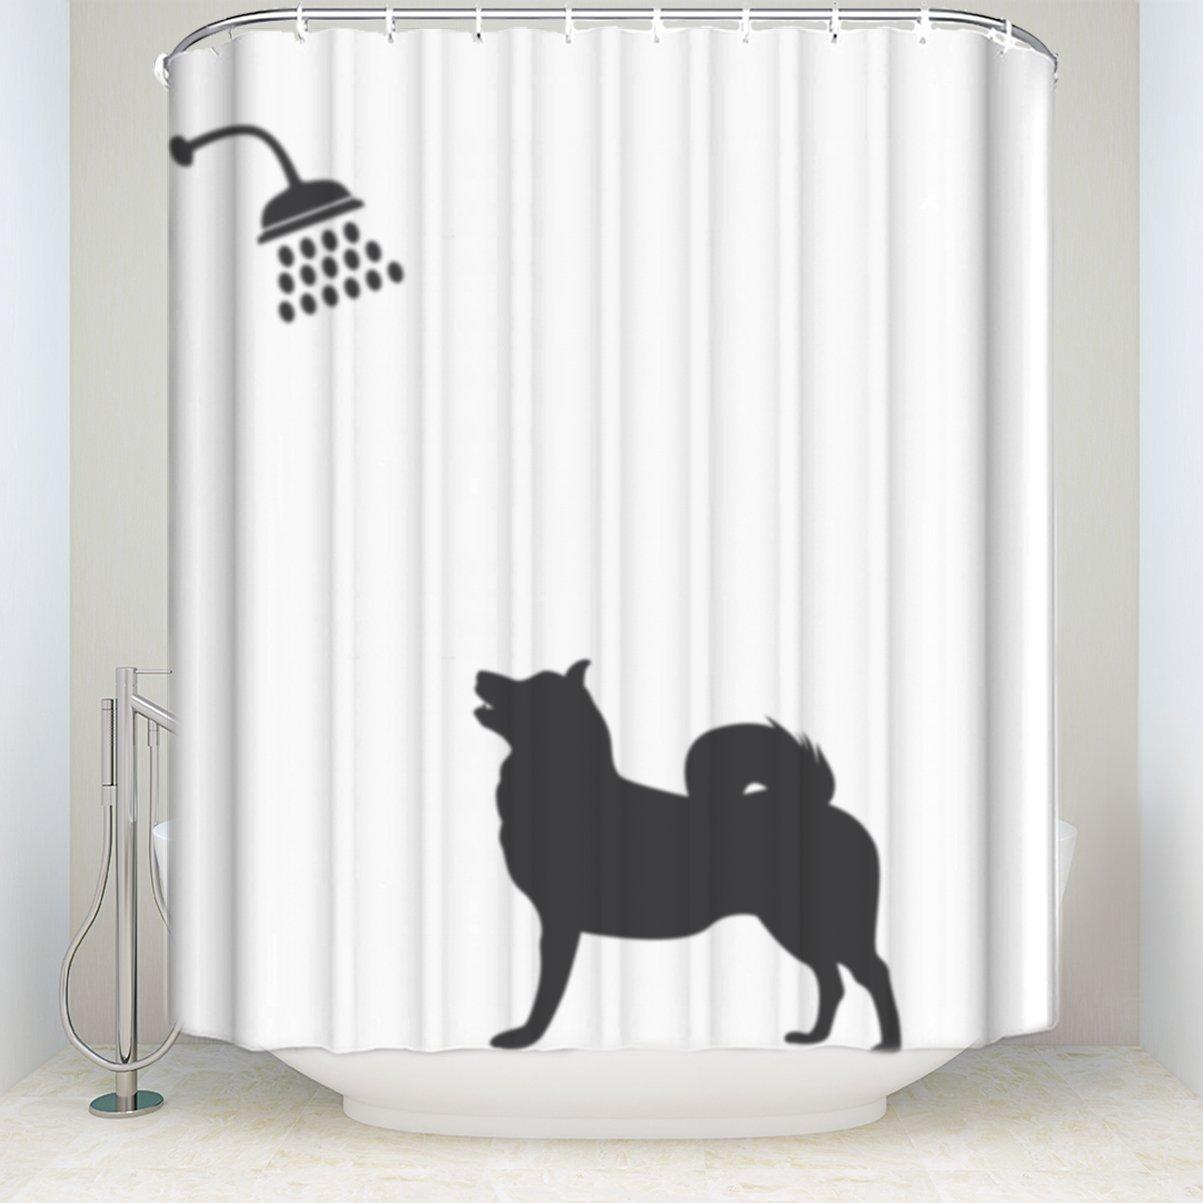 original weavestm weaves buy single waterproof ft yellow p checkered cm pvc shower curtain